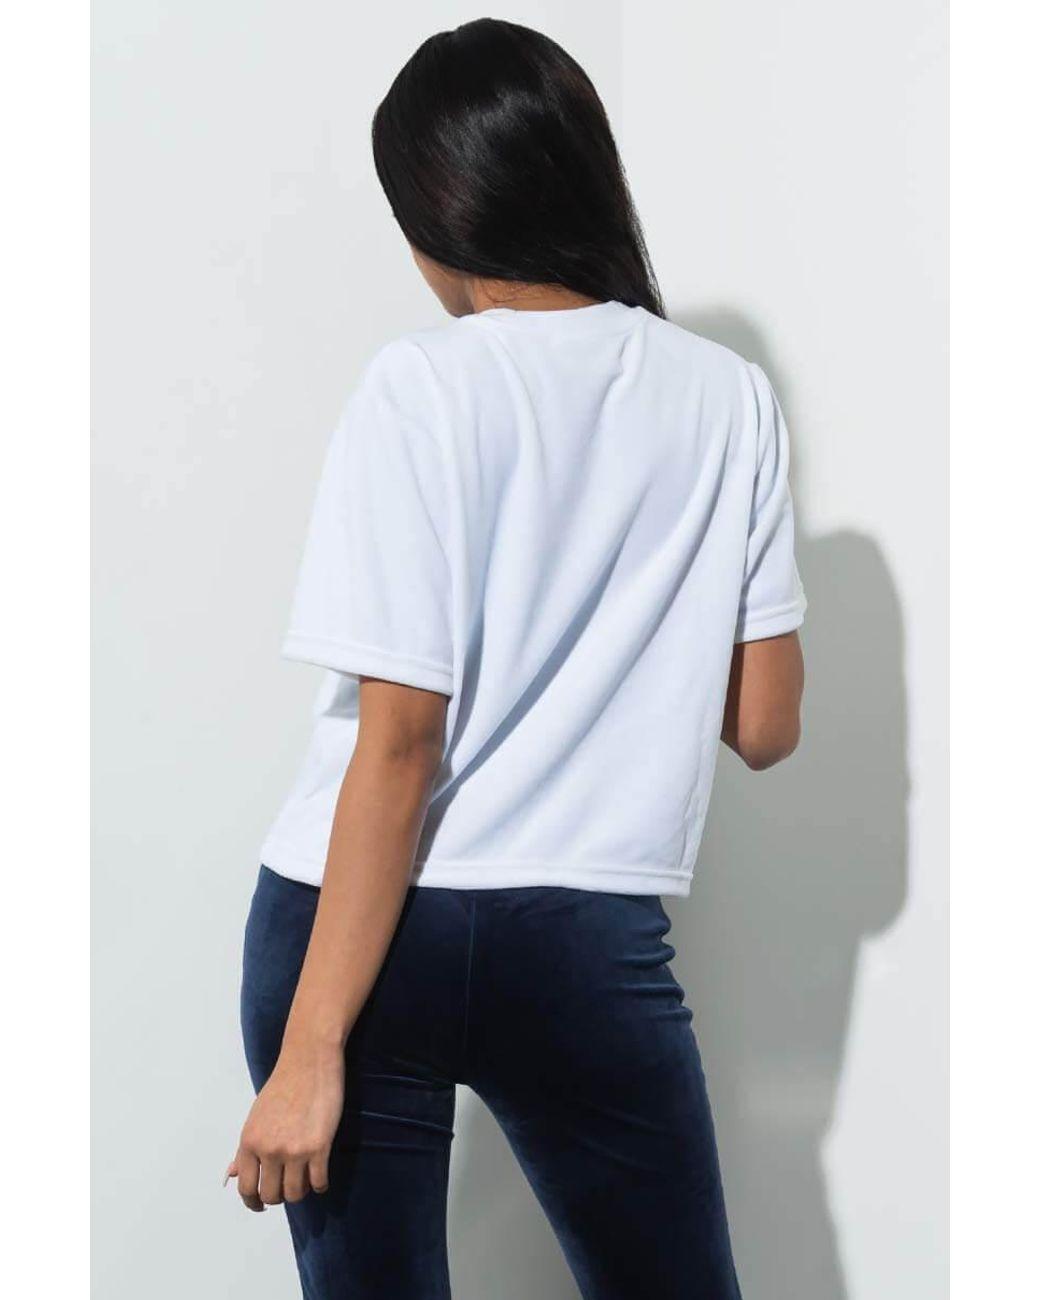 Image of R Green Floral Monogram Quote T-Shirts 3dRose Gabriella B